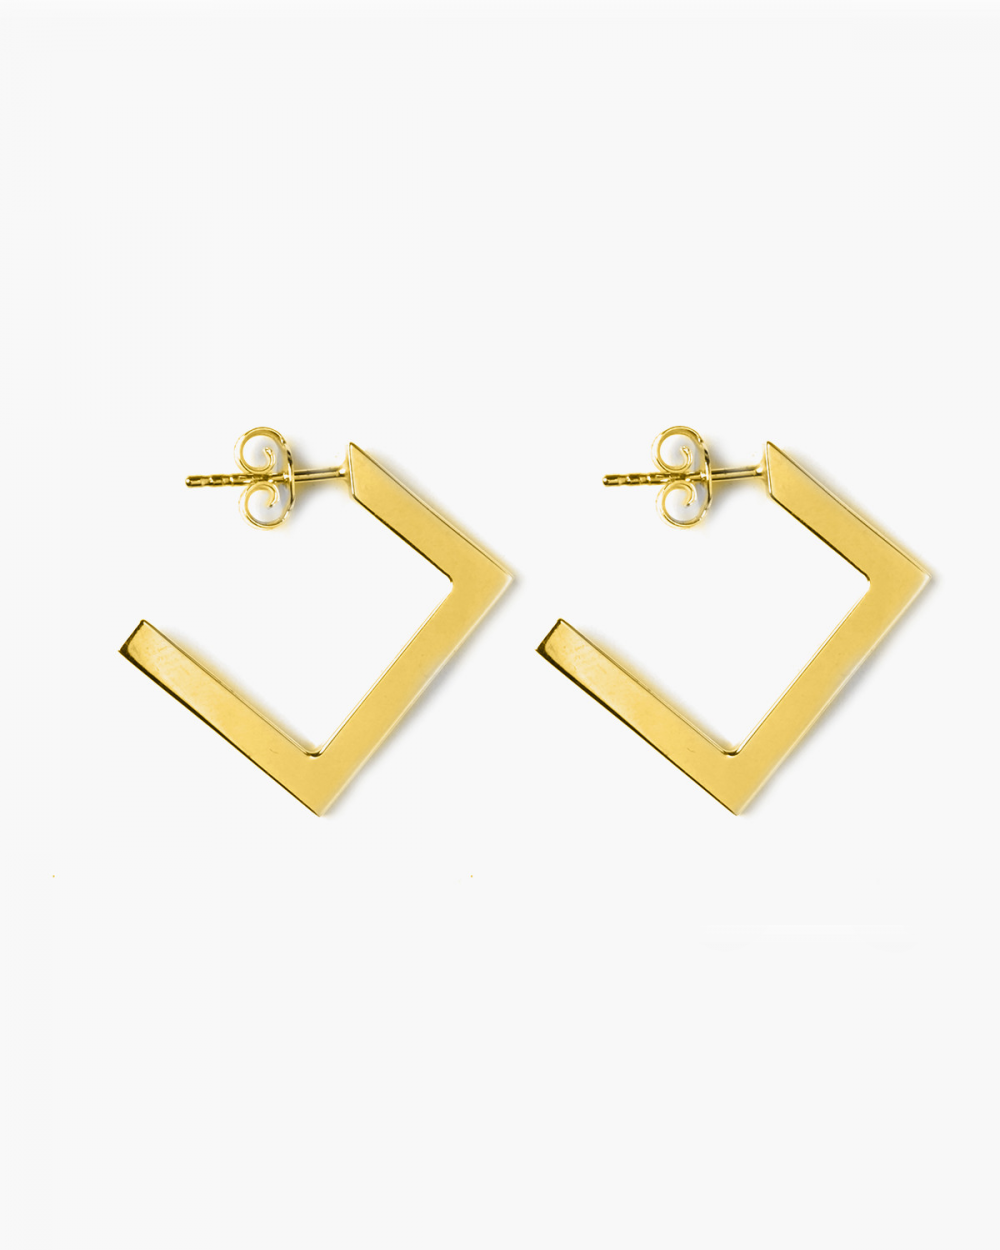 Earrings YELLOW GOLD RHOMBUS PLATE BIG EARRINGS NOVE25